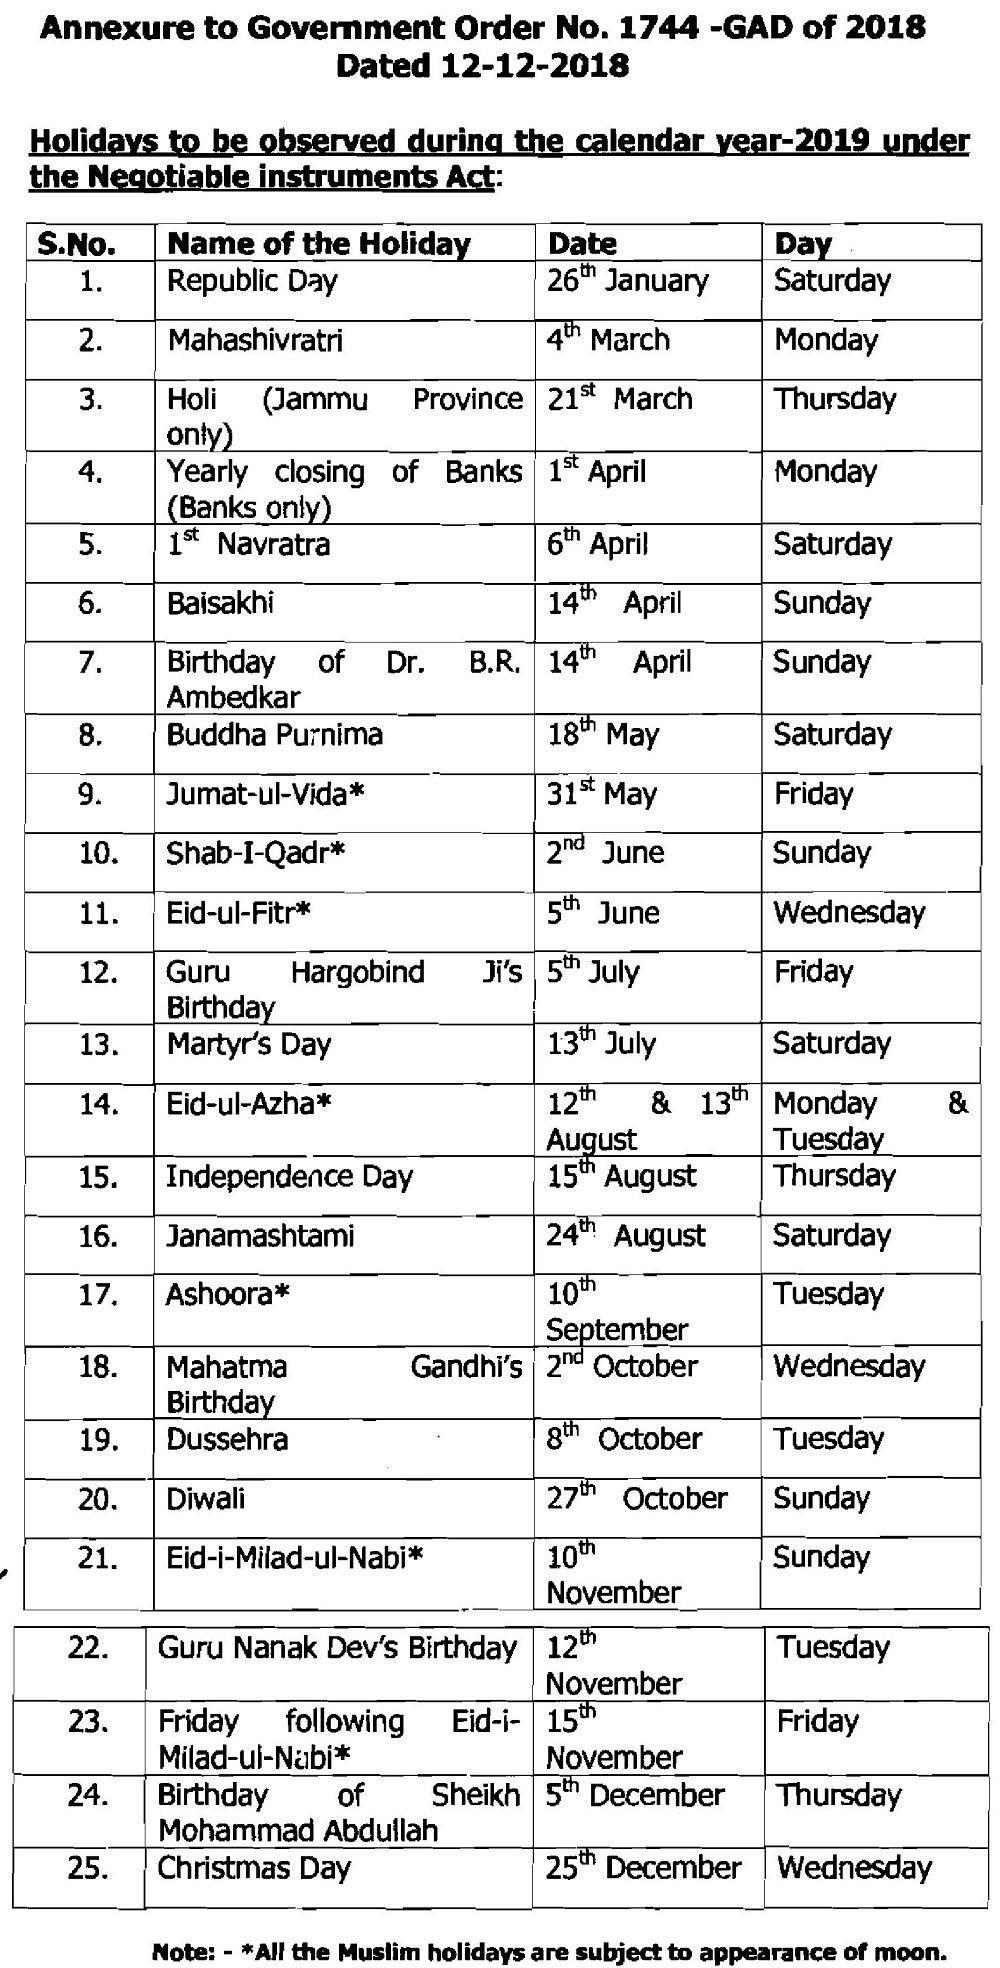 List Of Holidays In J&k For Calendar Year 2019 | News & Updates J&k Calendar 2019